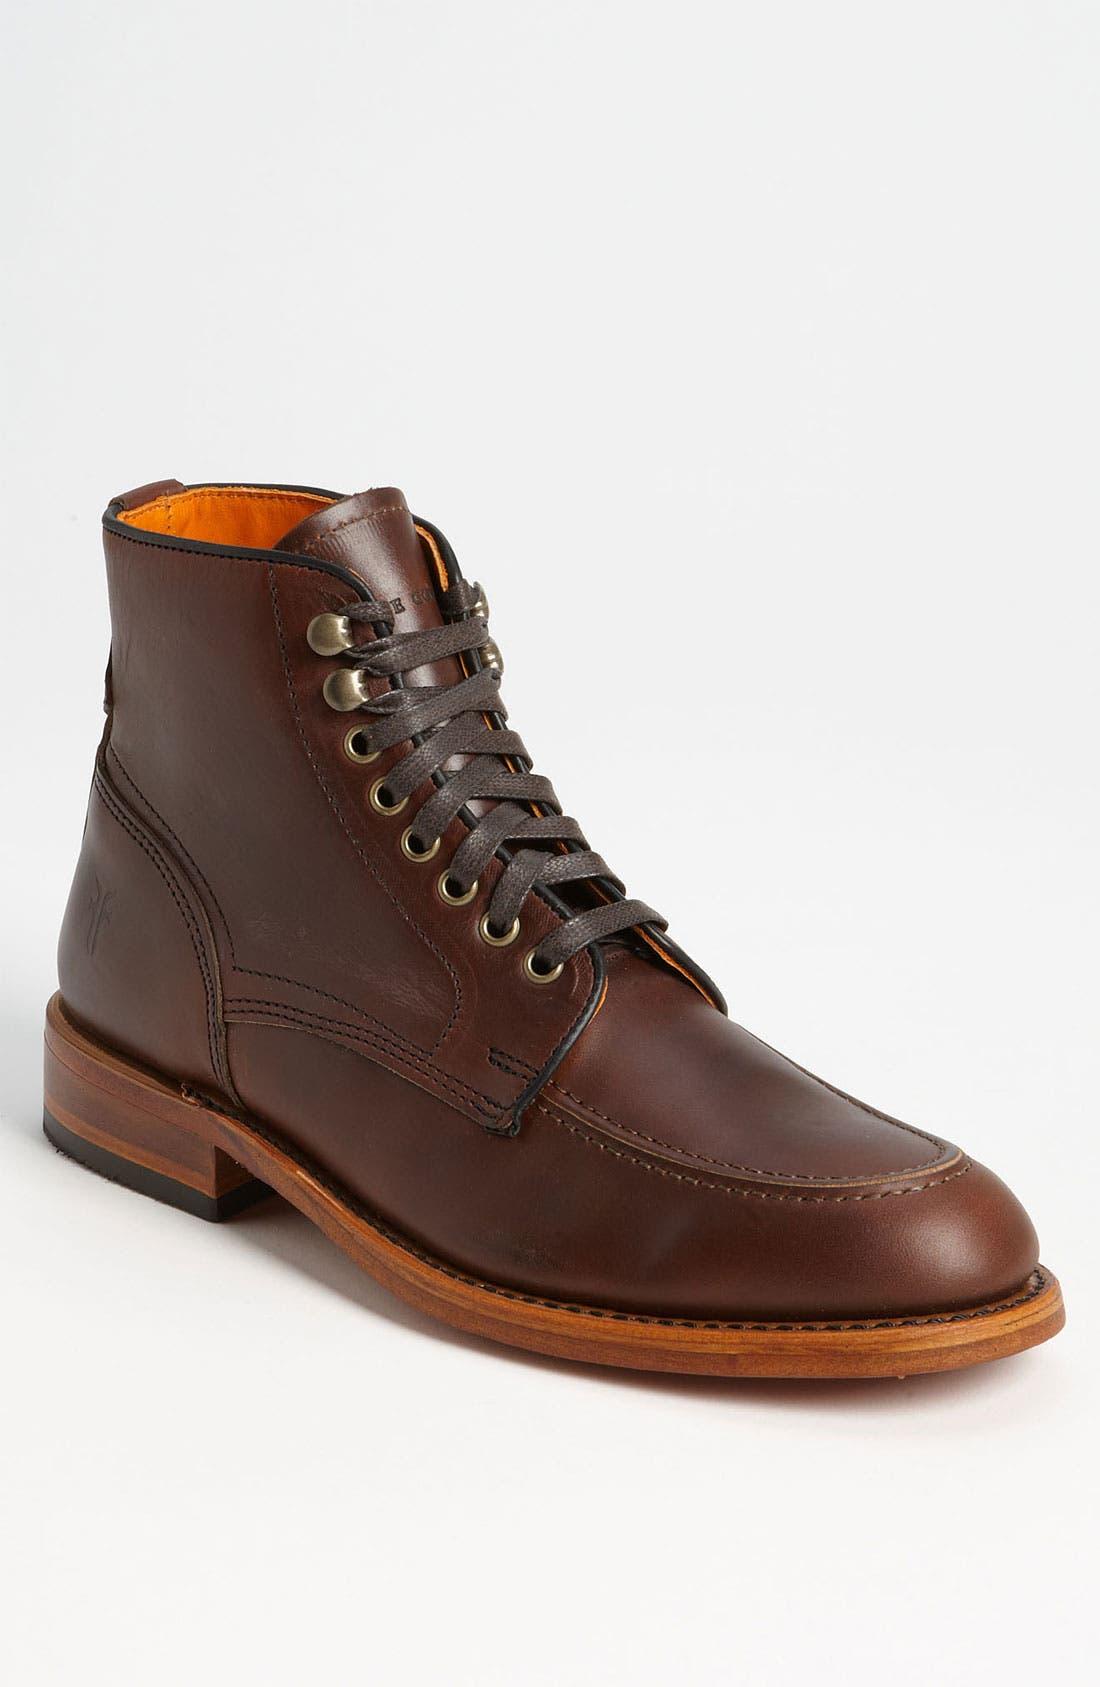 Alternate Image 1 Selected - Frye 'Walter' Boot